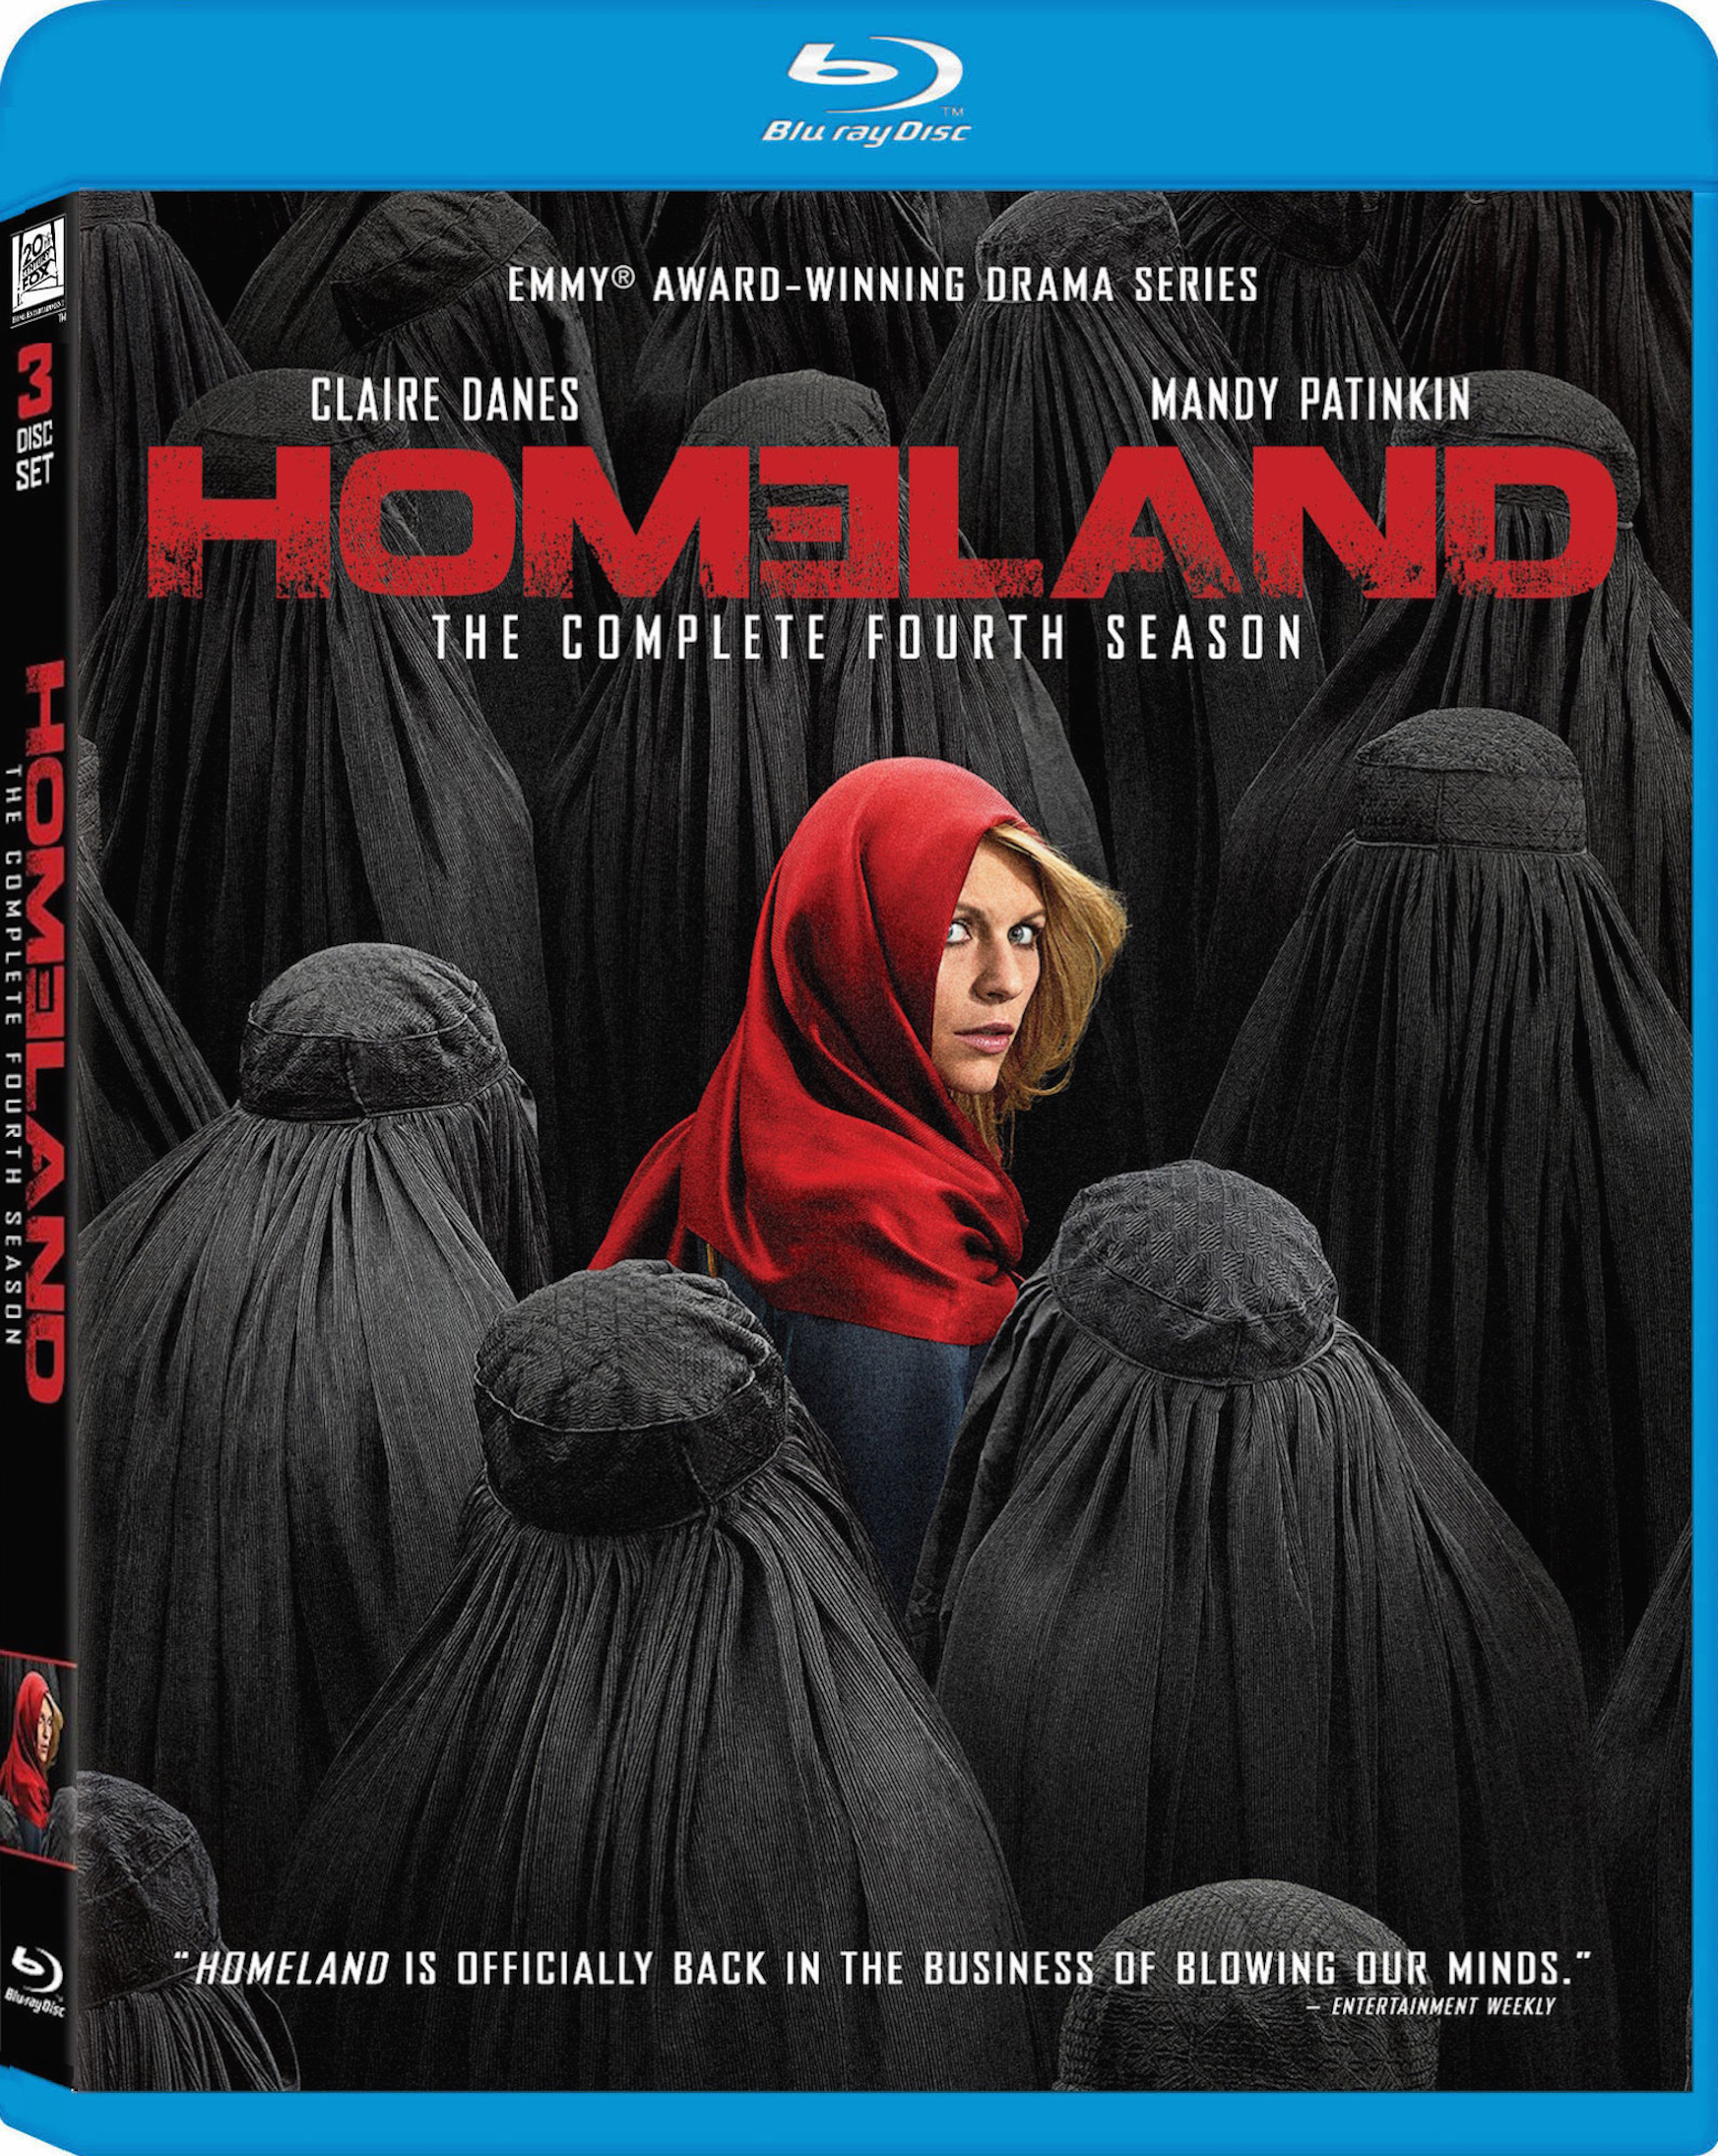 Homeland: The Complete Fourth Season Blu-ray